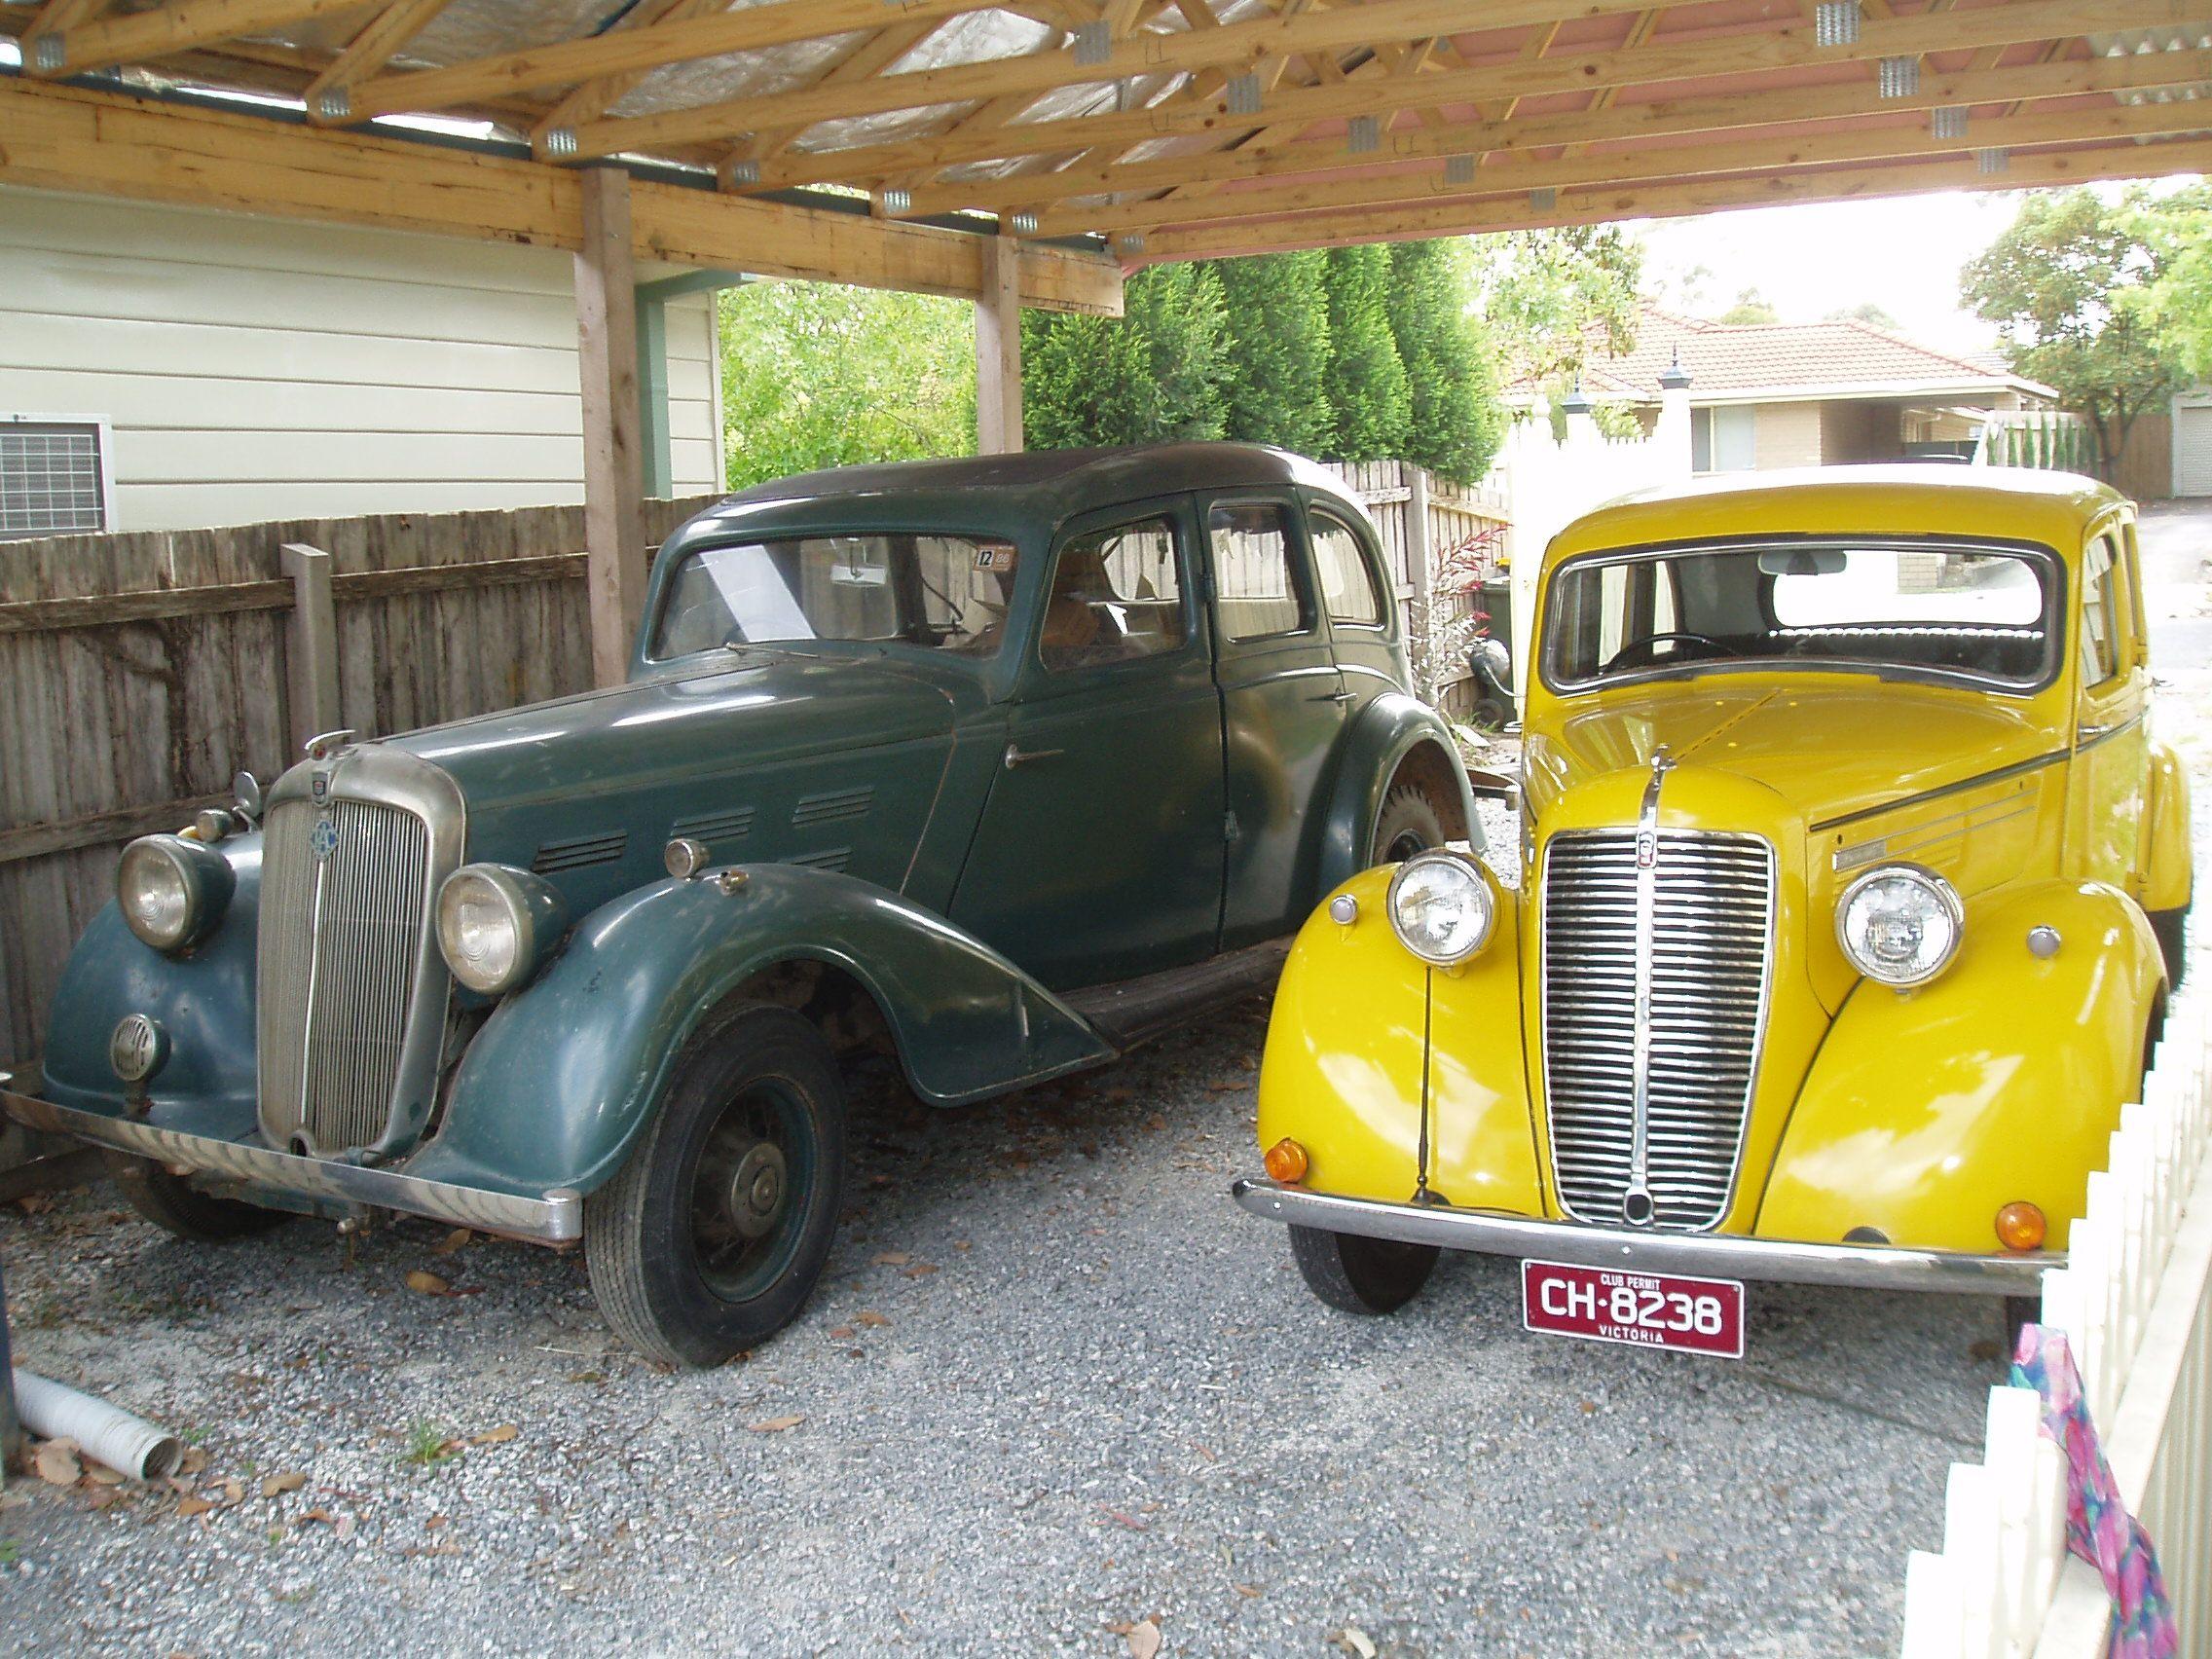 1936 morris 25 and 1947 morris10 morris cars pinterest cars. Black Bedroom Furniture Sets. Home Design Ideas